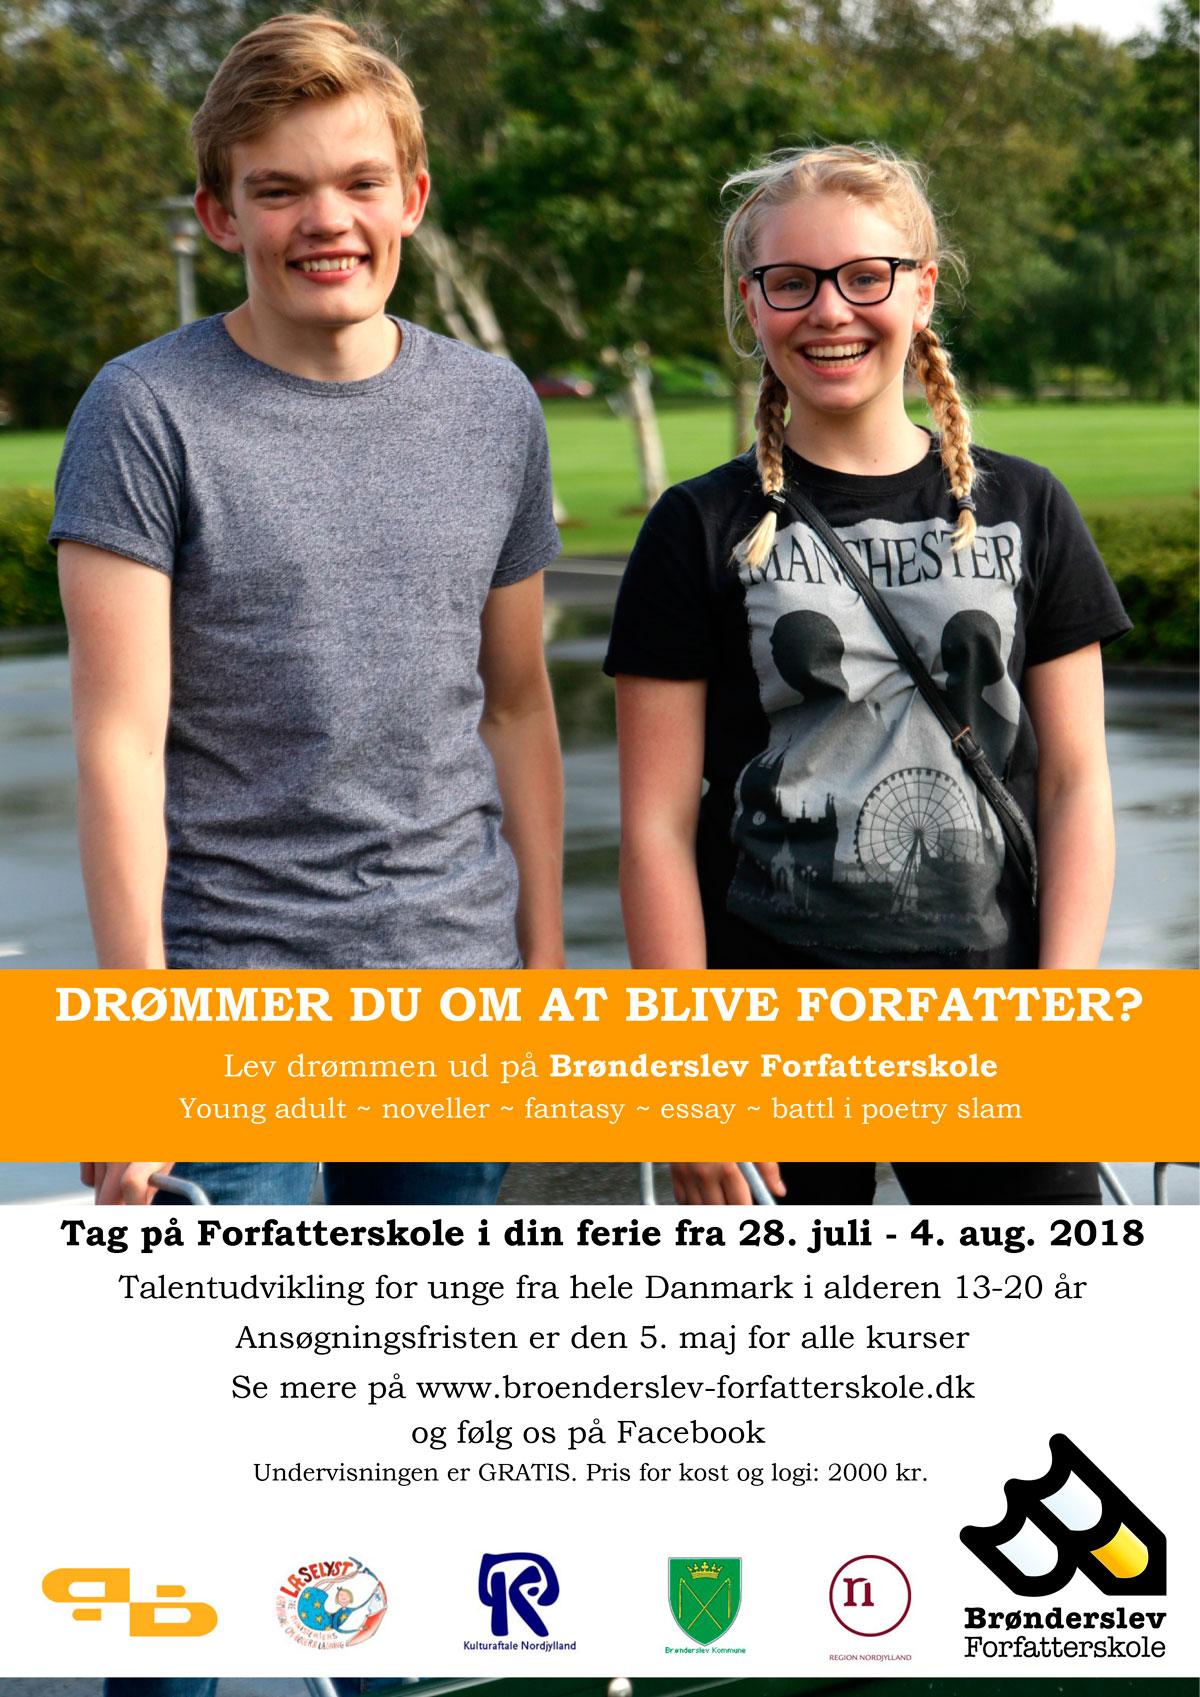 Brønderslev Forfatterskole 2018